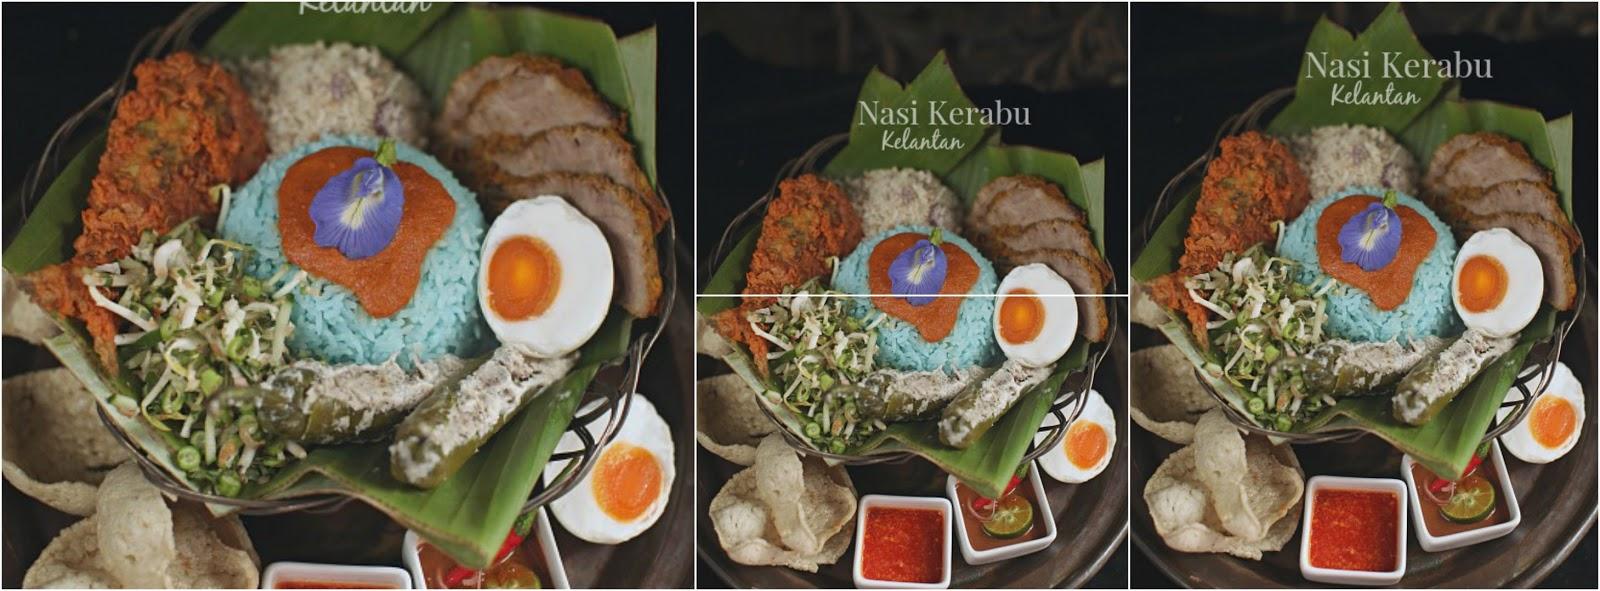 Resepi Nasi Kerabu Kelantan by Azlita Masam Manis